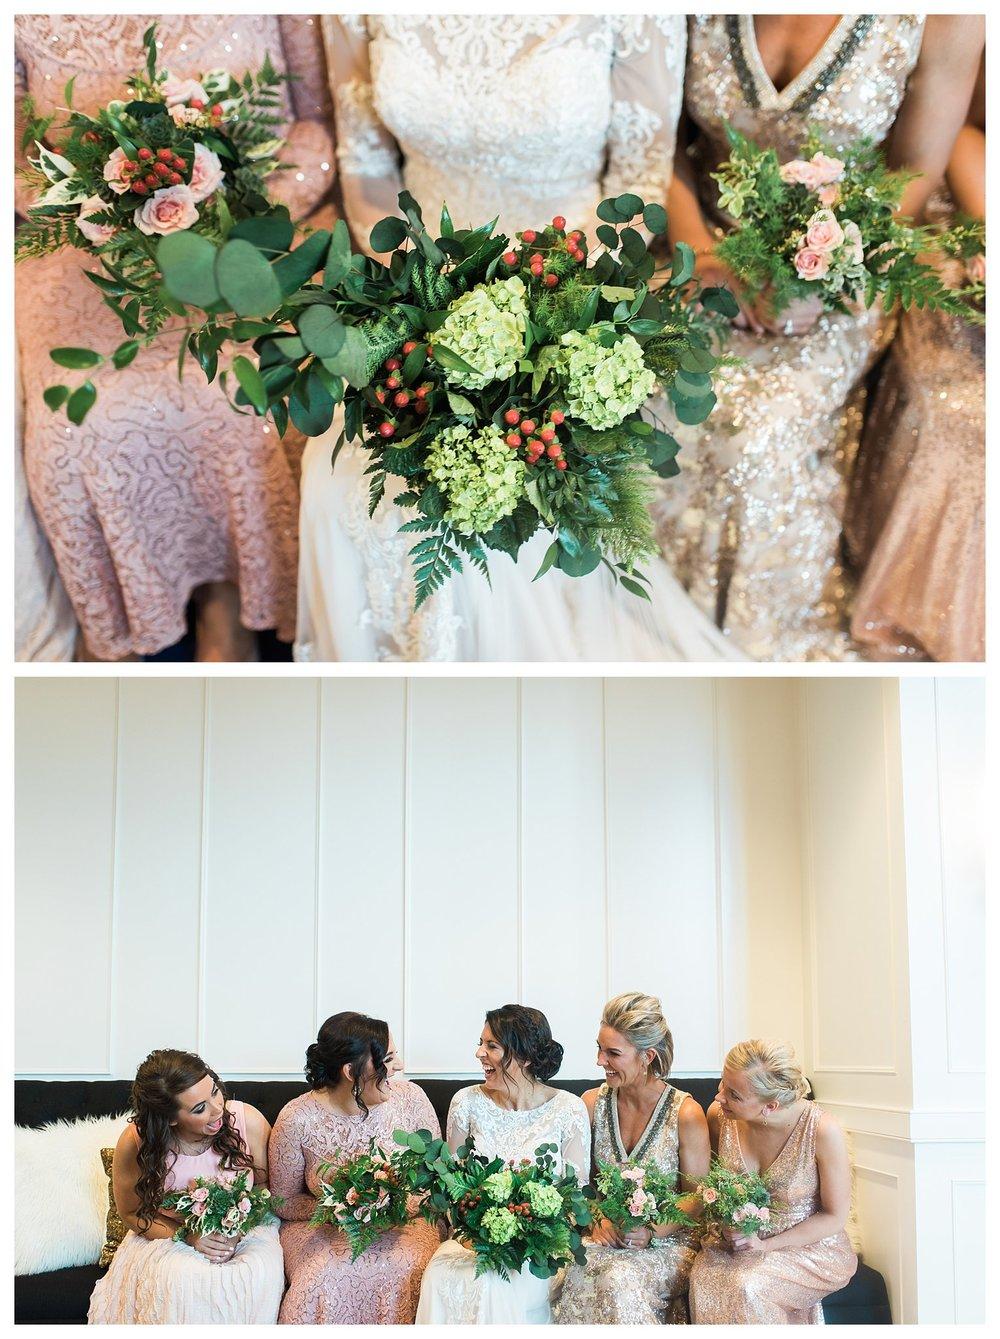 everleigh-photography-new-riff-distillery-cincinnati-wedding-photographer-northern-kentucky-wedding-photographer-jamie-and-dan-14